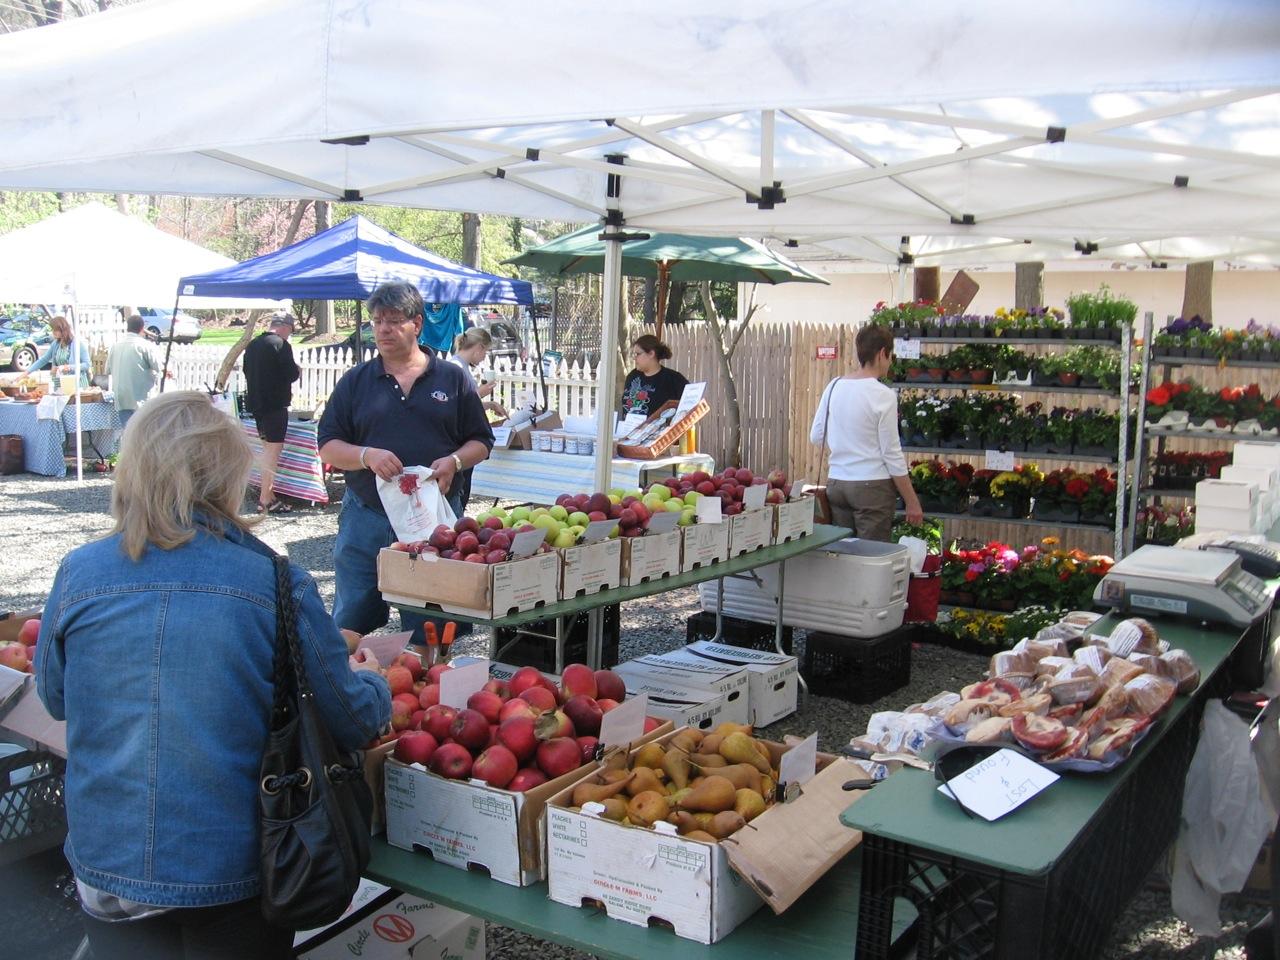 Palisades Farmers' Market